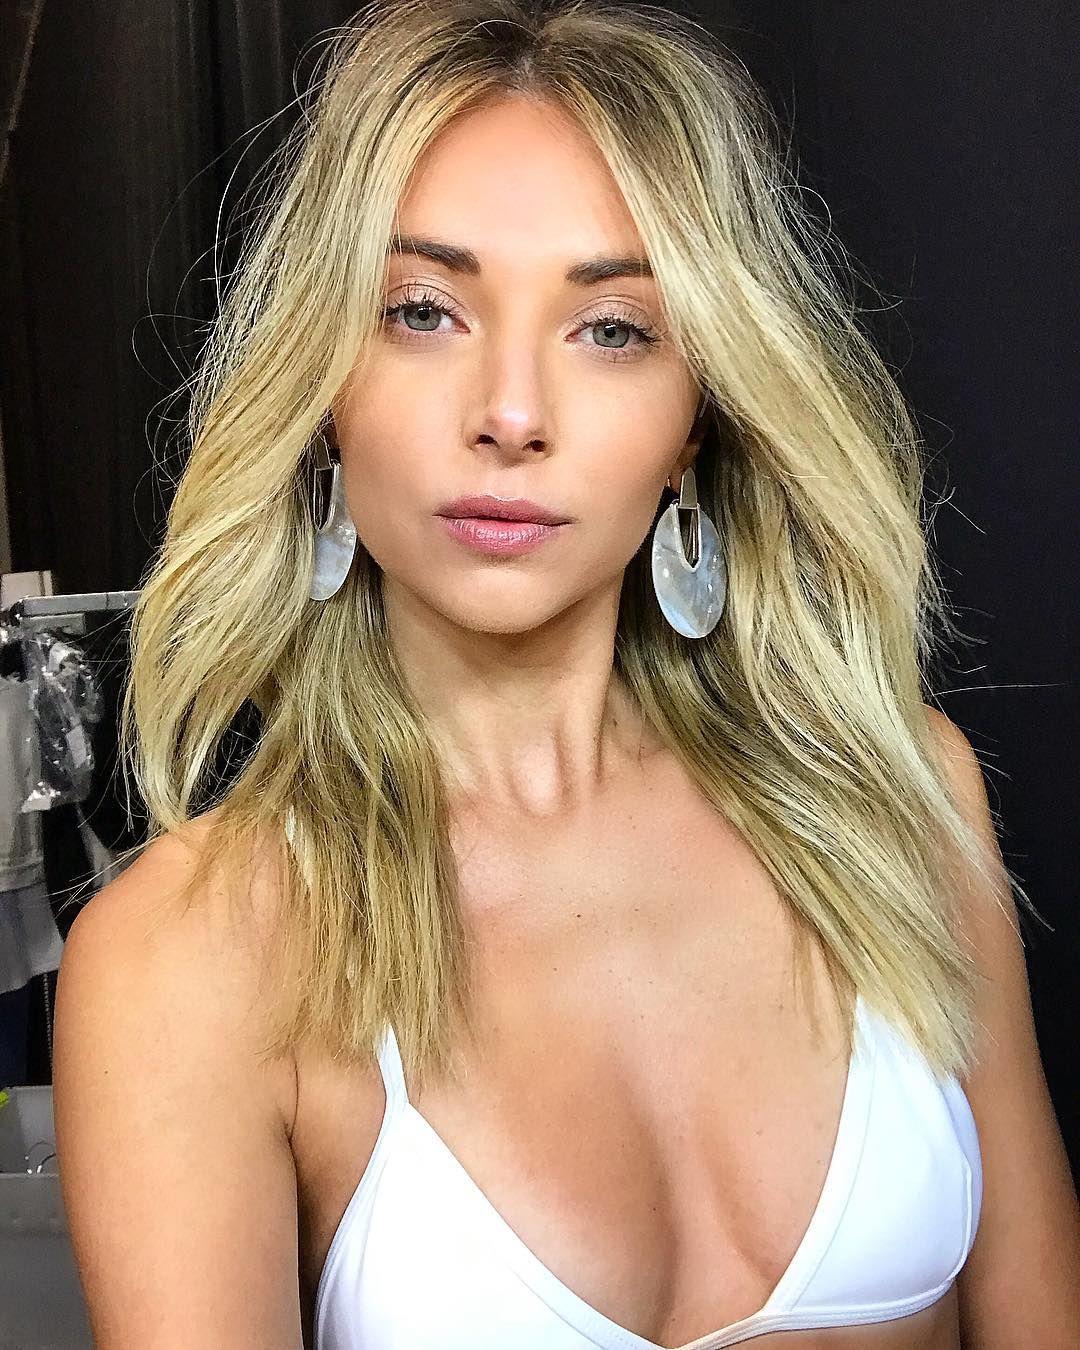 Instagram Ludi Delfino naked (43 foto and video), Tits, Sideboobs, Selfie, cameltoe 2006